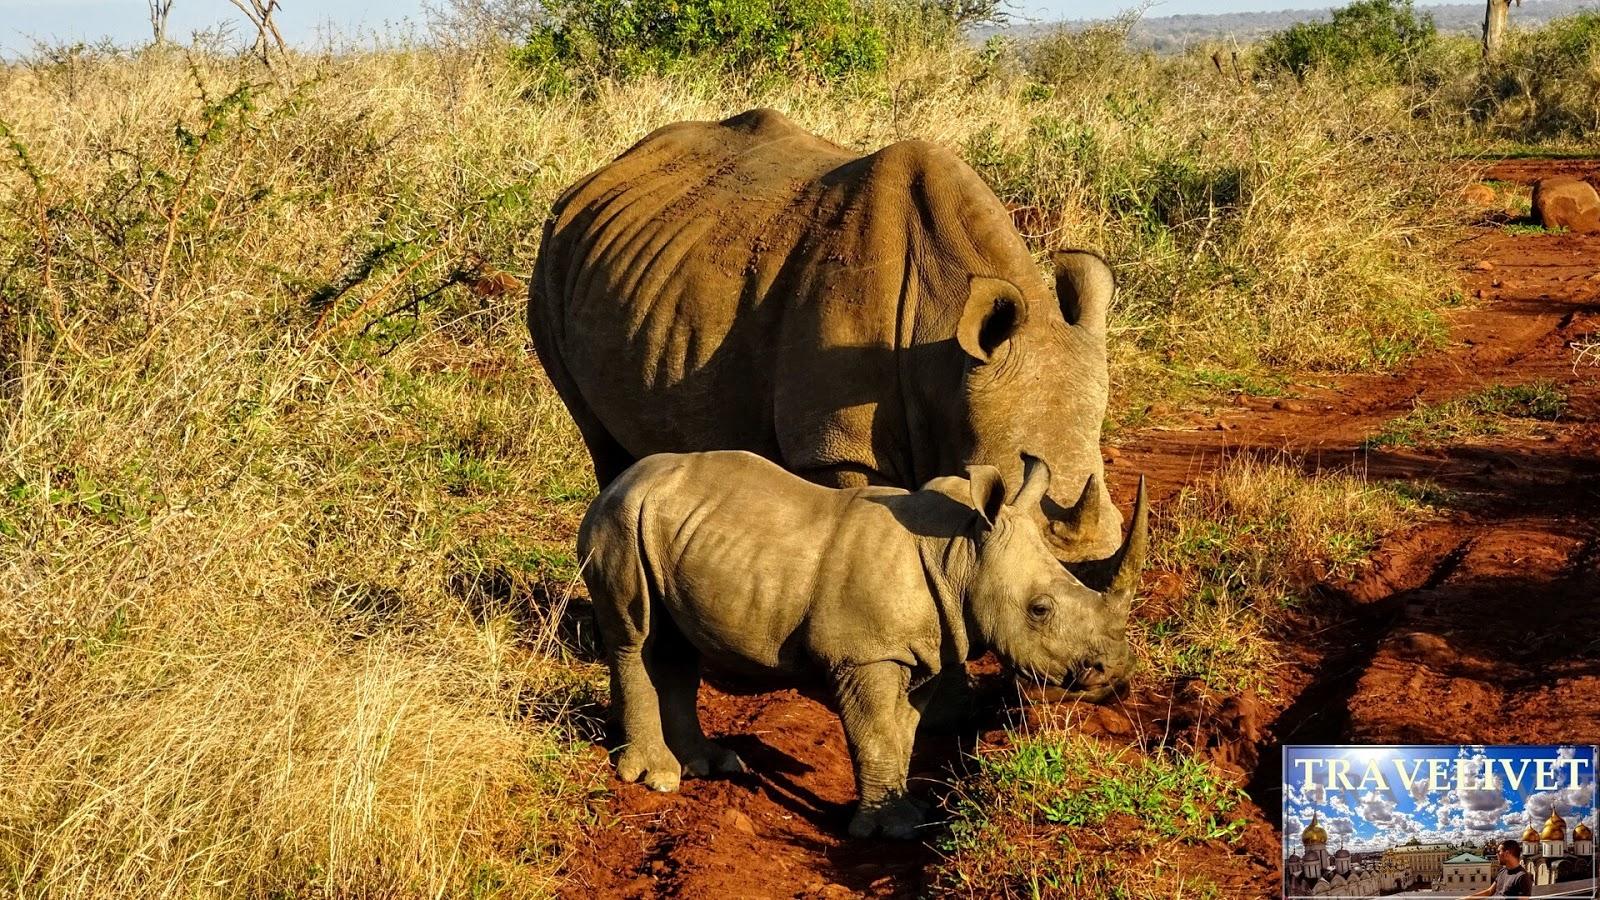 Safari Mkhaya Game Reserve du Swaziland Rhinocéros bébé